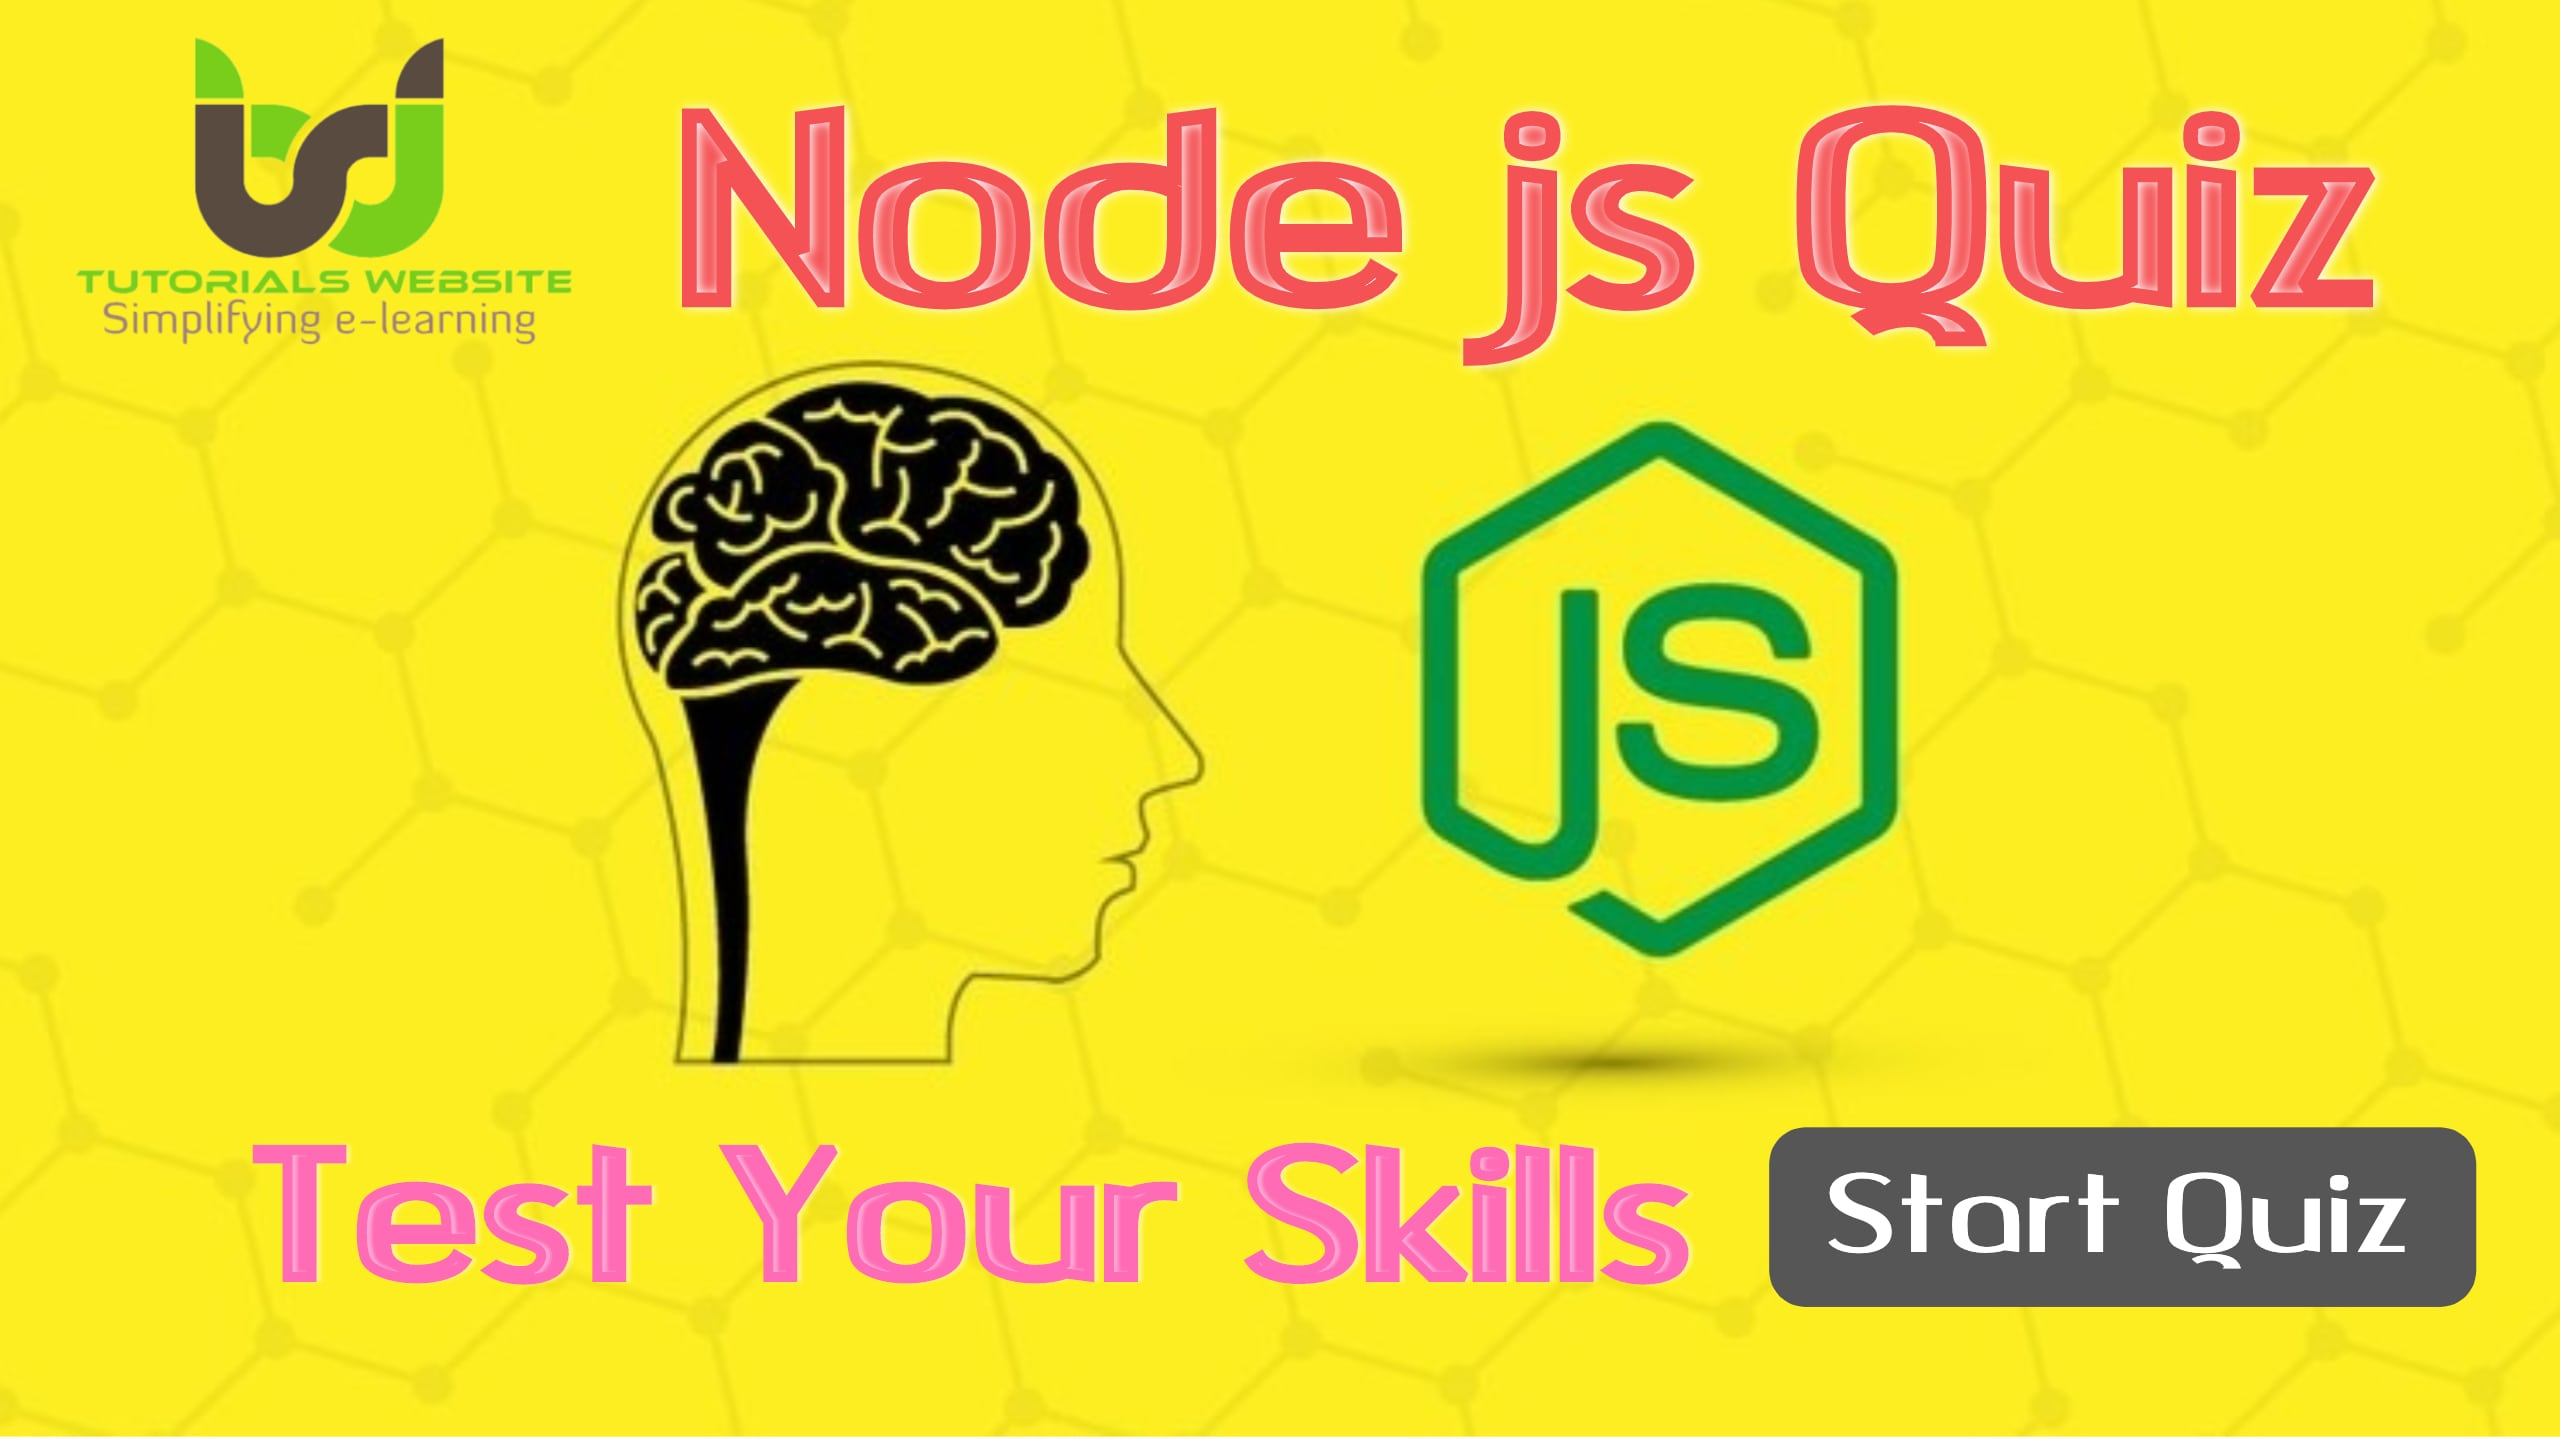 Node Js Quiz Test | Tutorials Website